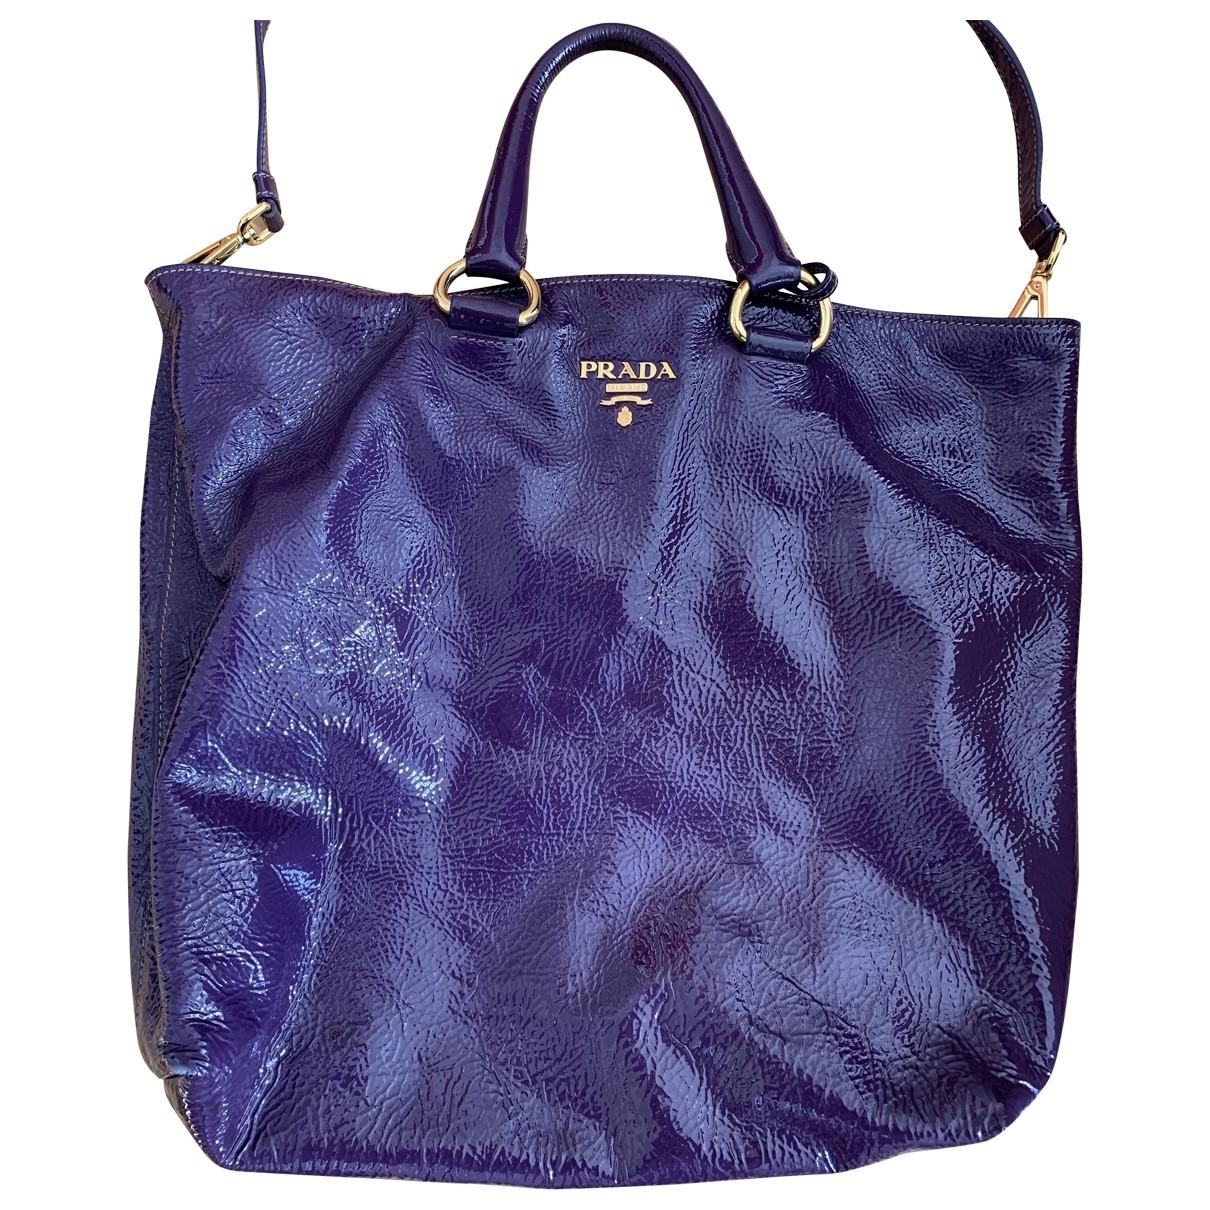 Prada \N Purple Patent leather handbag for Women \N